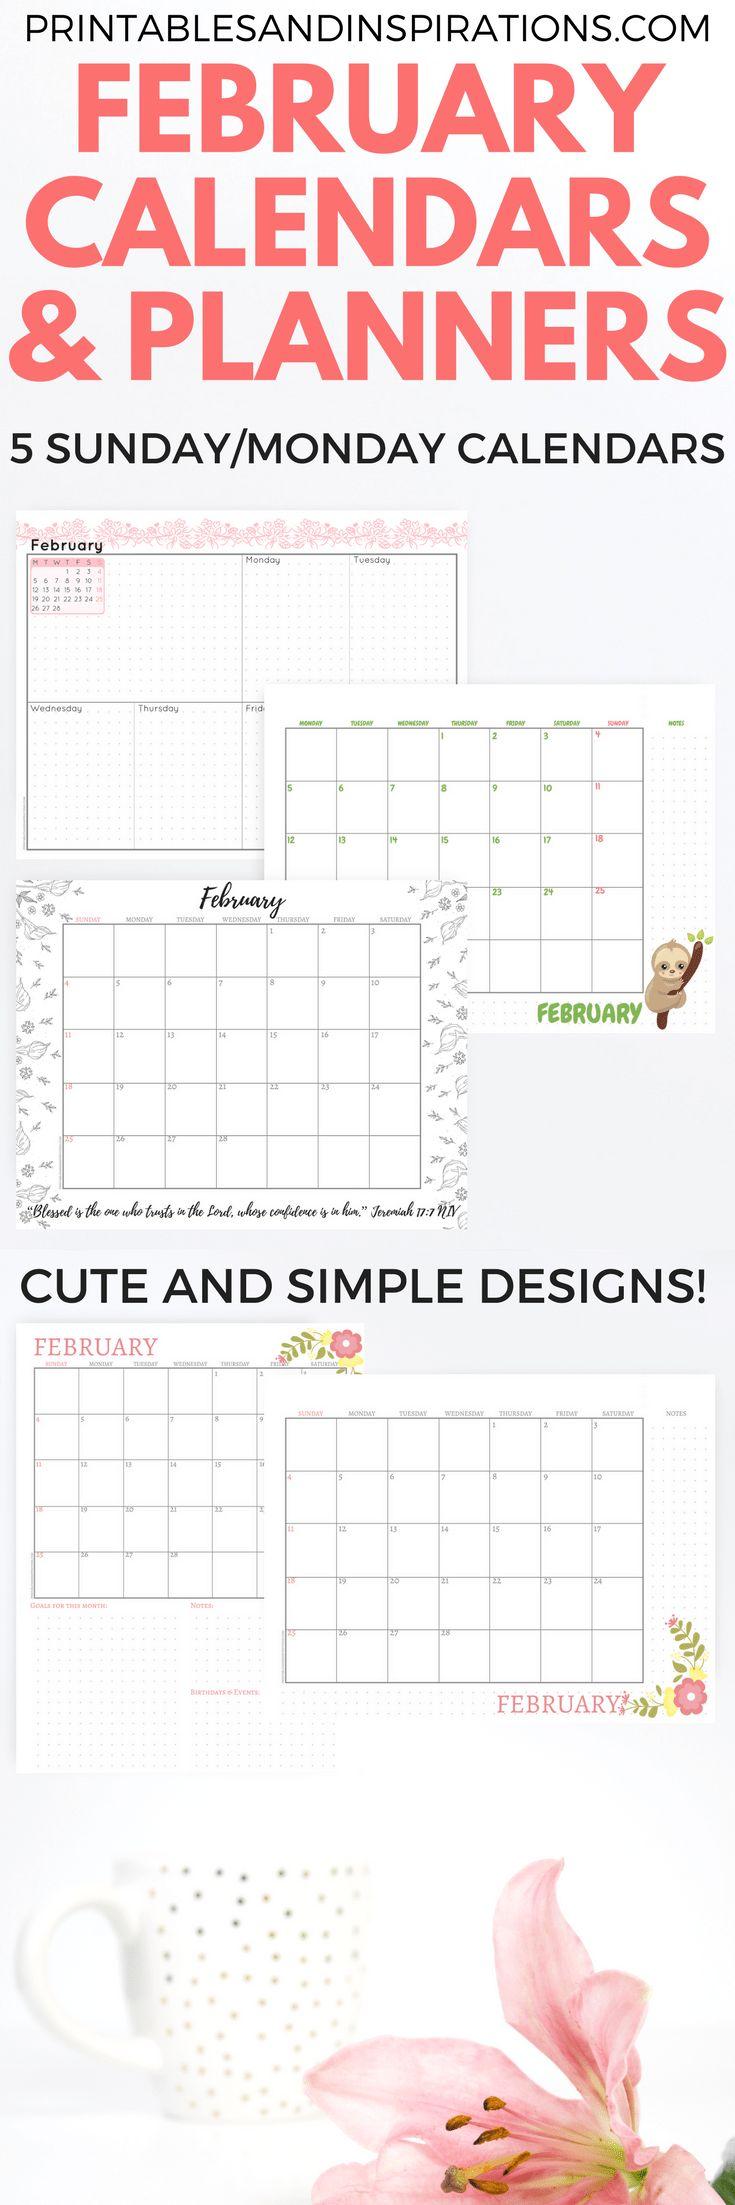 February 2018 printable calendars, printable planners, monthly planner, weekly planner, February calendar printables